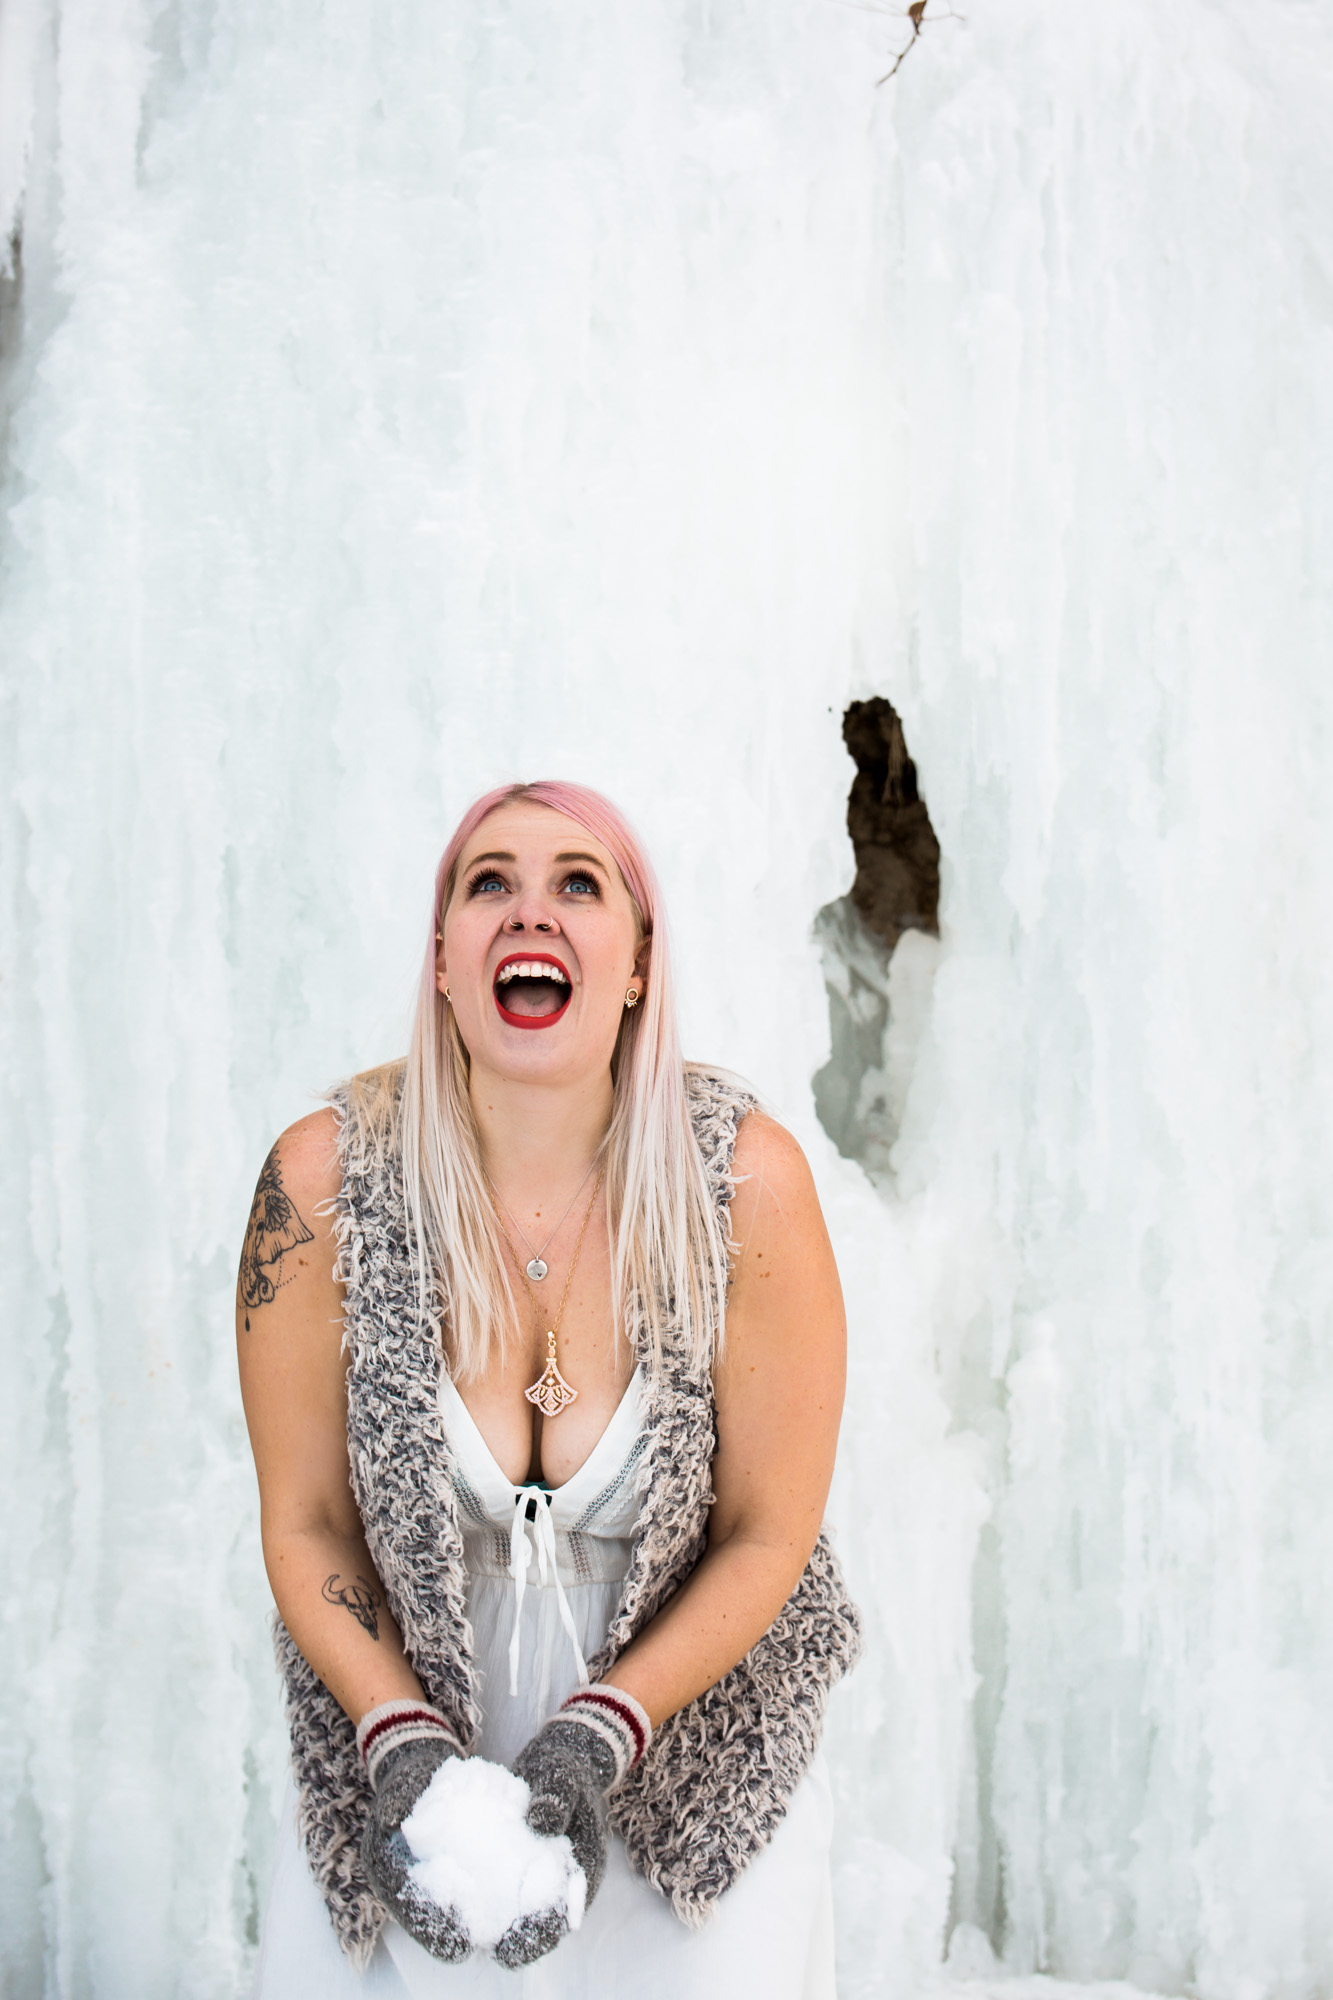 Calgary photographer - photos at the Fish Creek Park Ice Caves